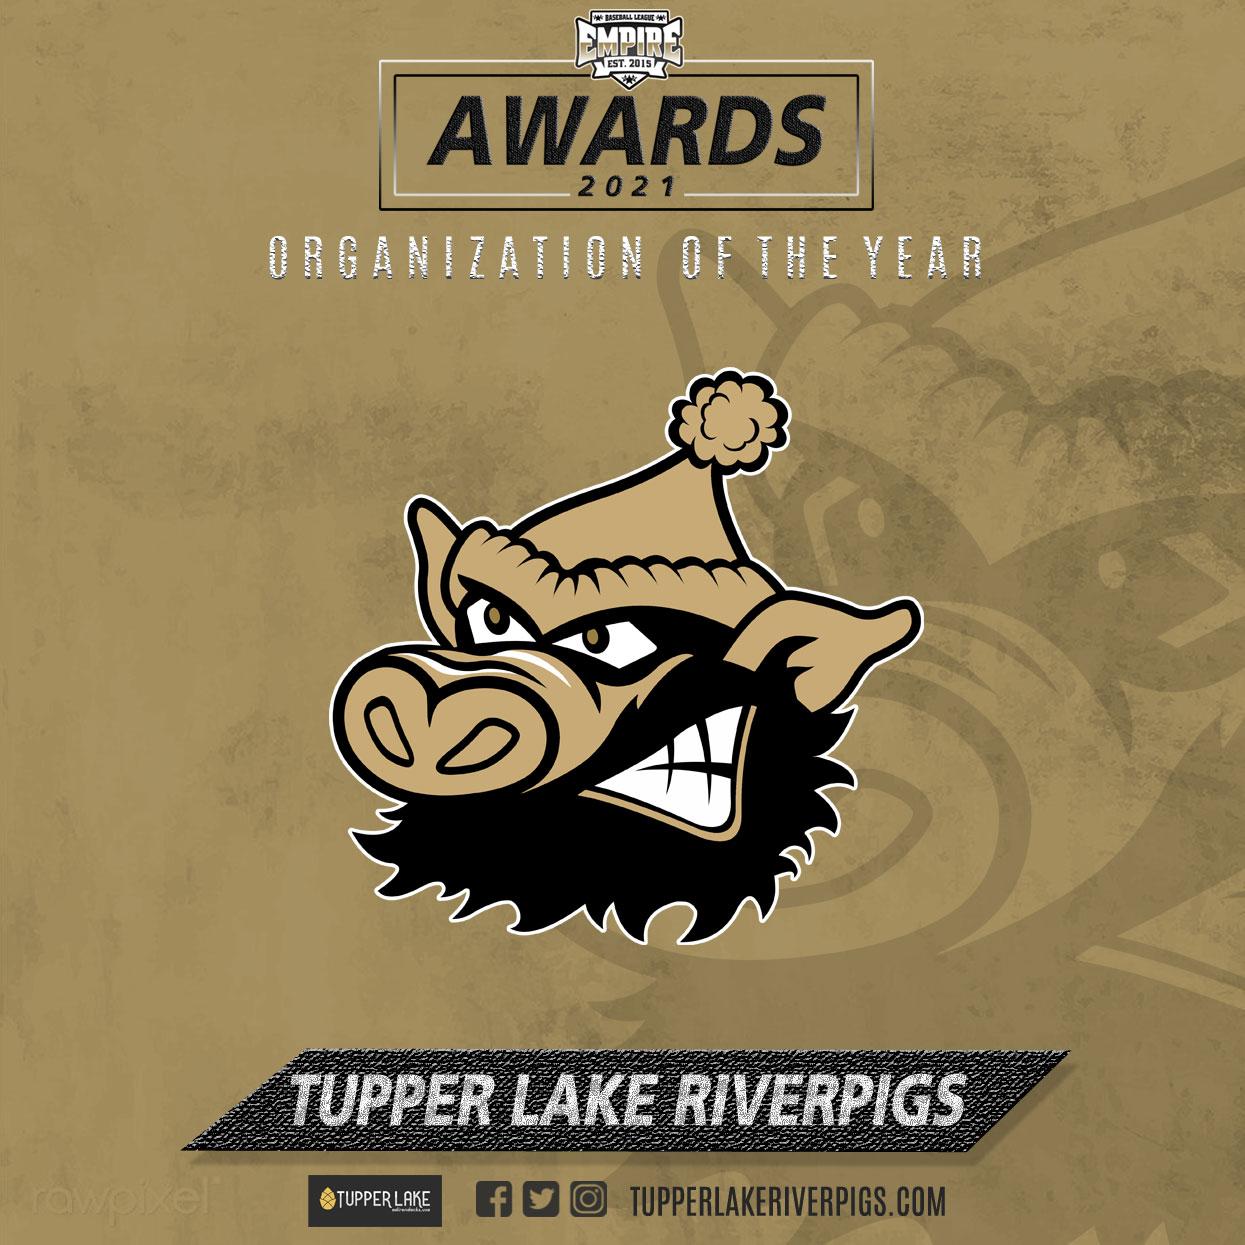 Awards-Organization-of-the-Year2